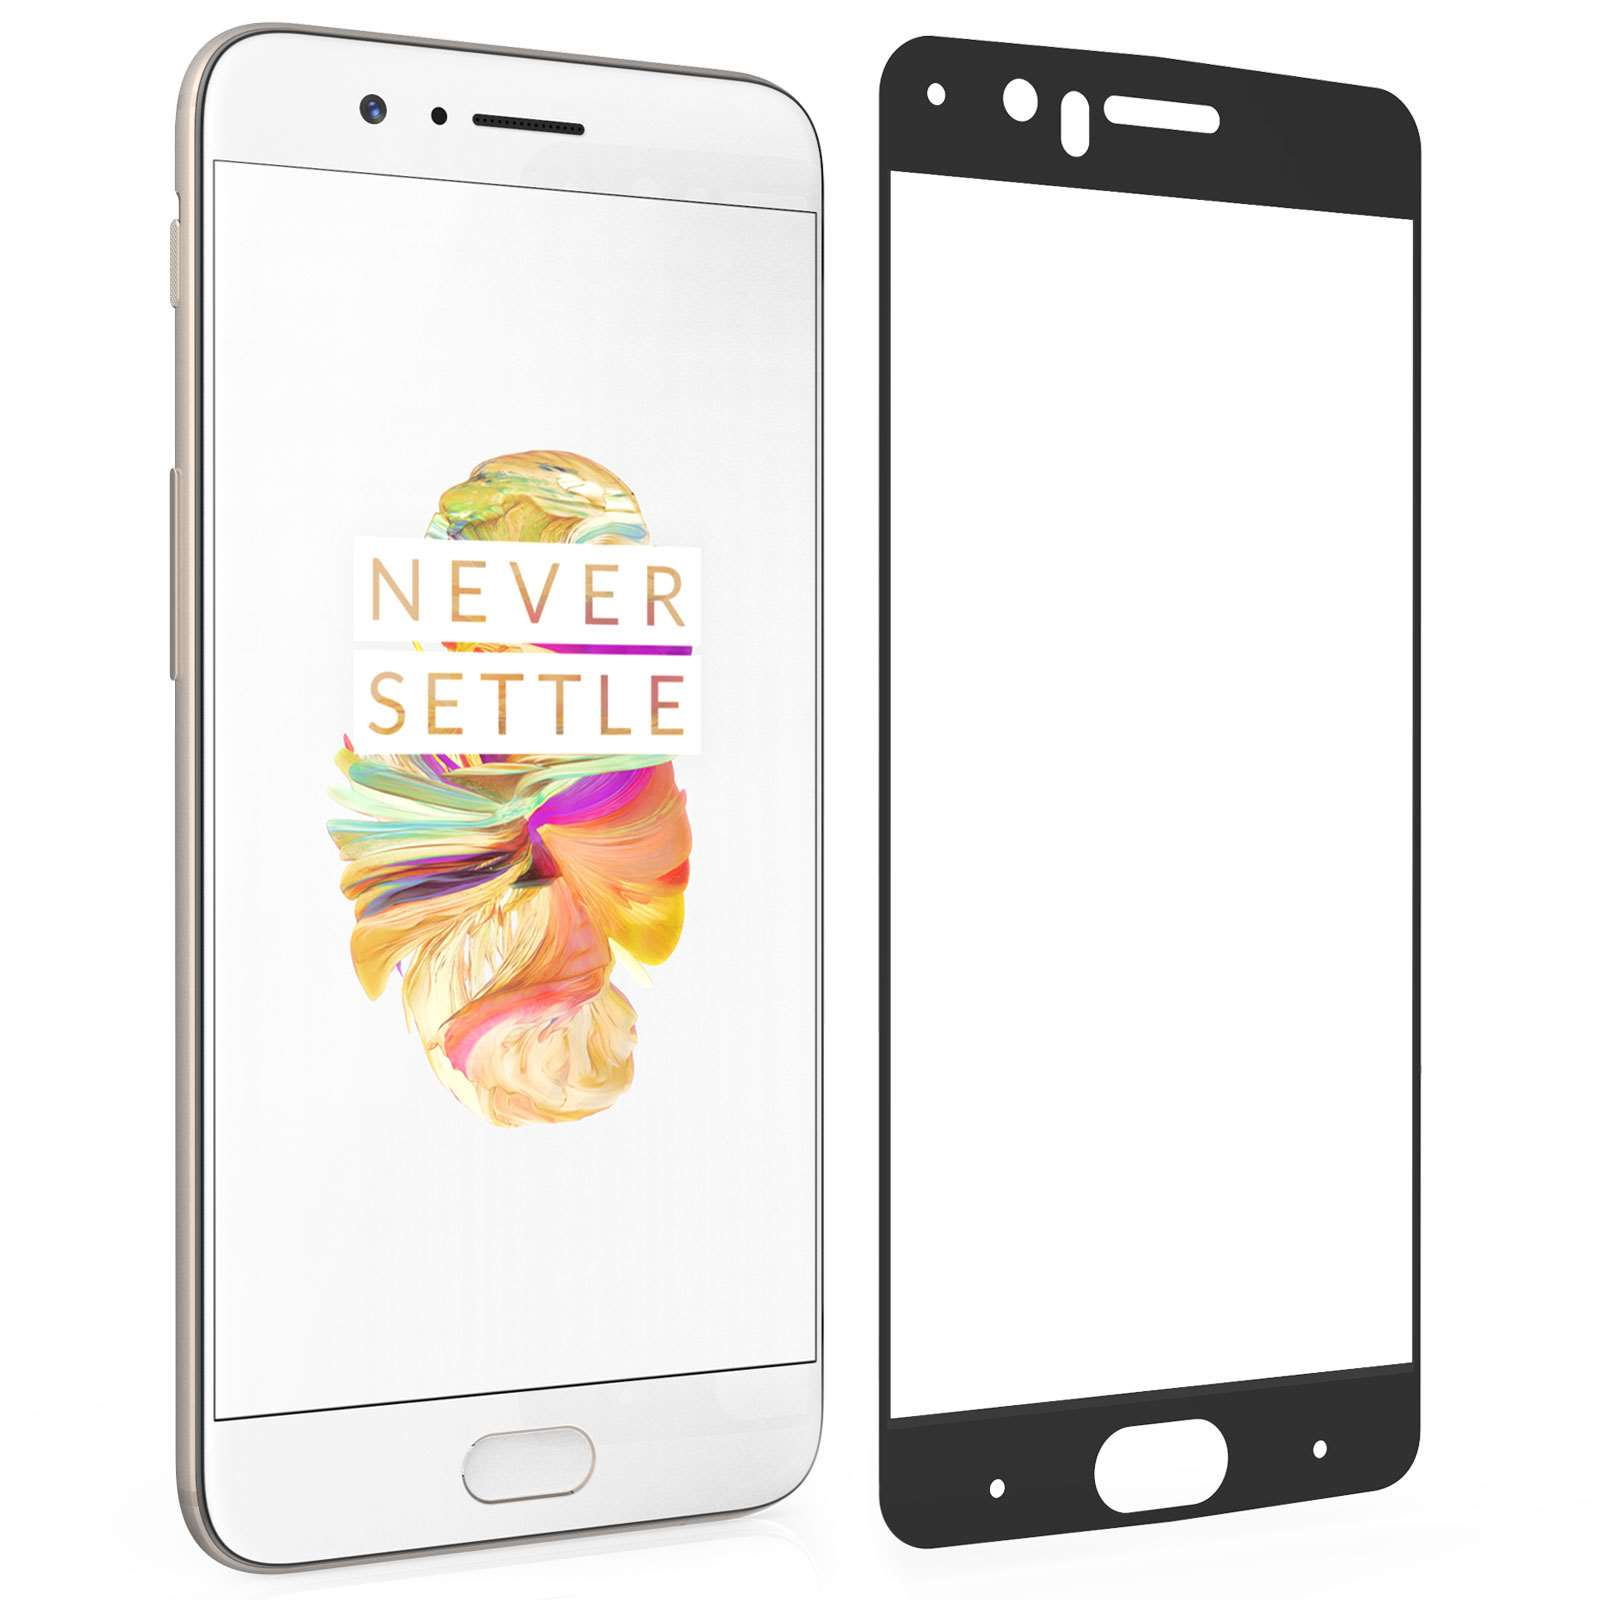 Centopi Tempered Glass - Αντιχαρακτικό with Black Edge Γυαλί Οθόνης OnePlus 5 (CEN-ONE-0009)